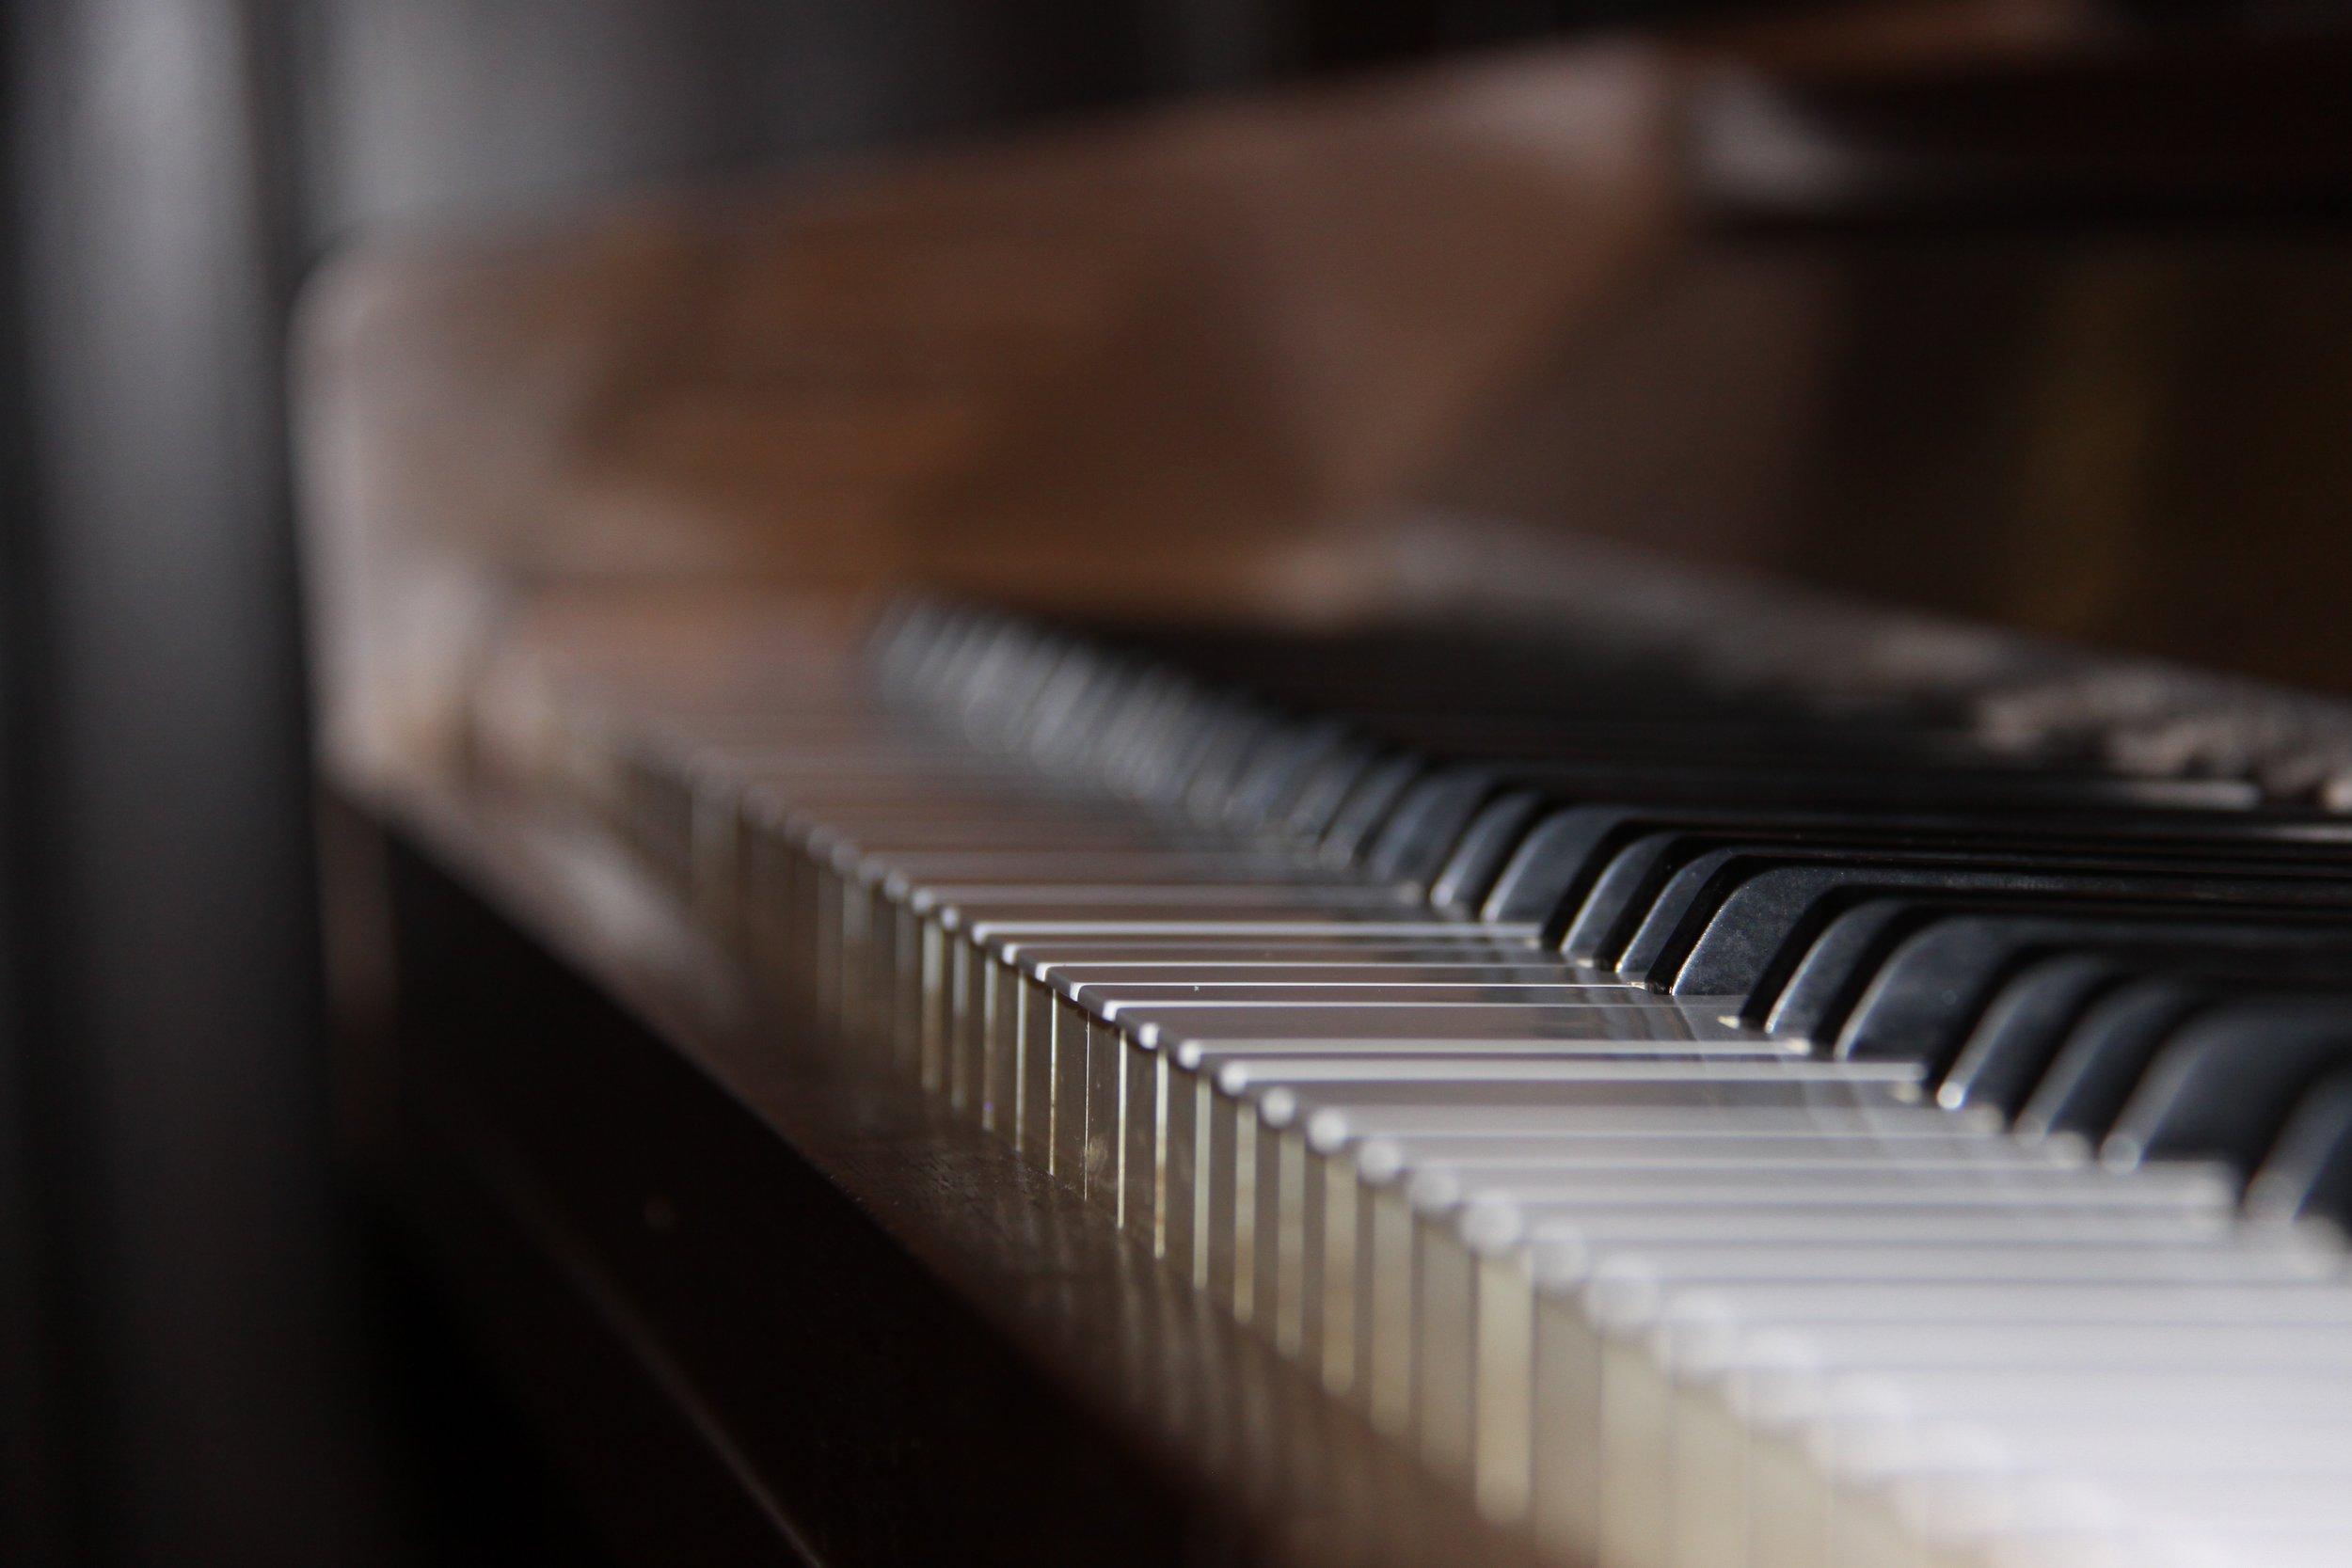 Sergio Gaetani's Piano used on North Coast Electric